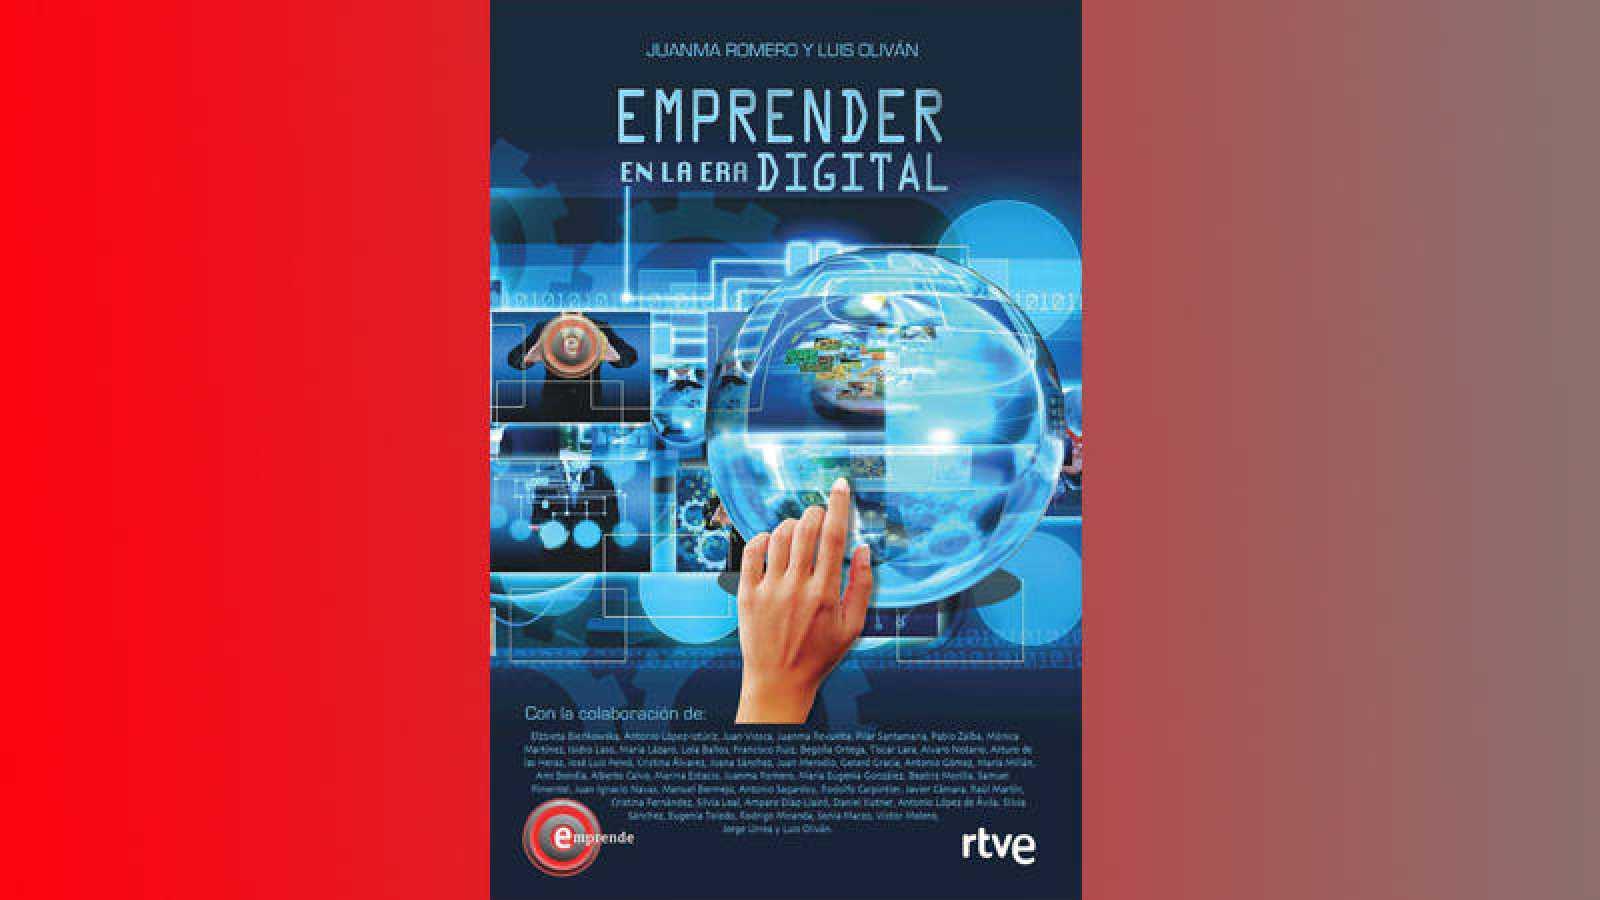 Emprender en la era digital